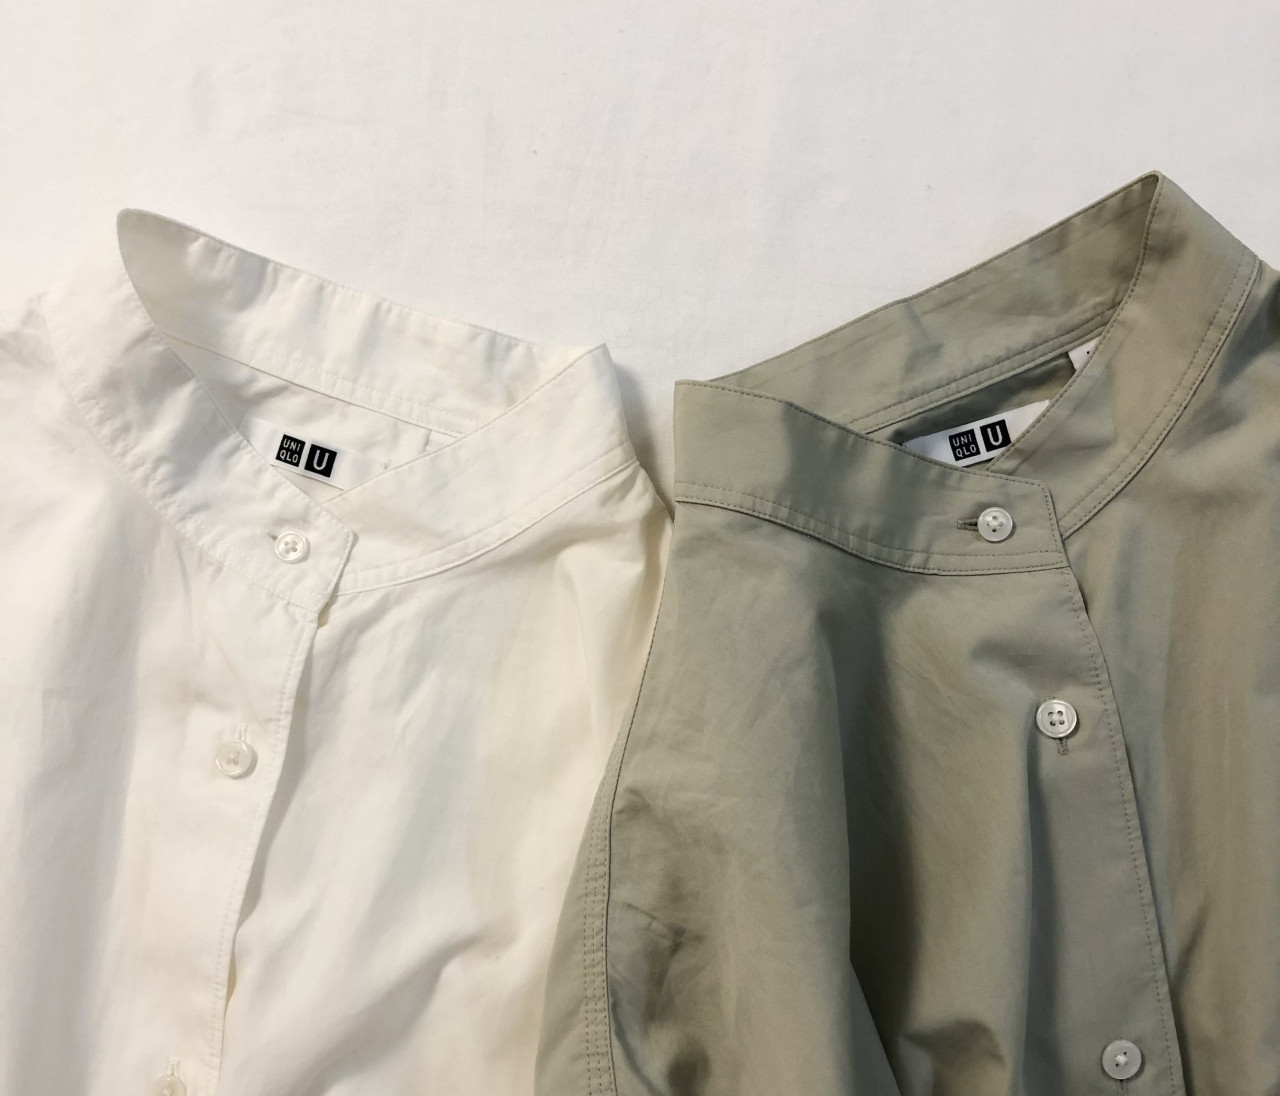 【UNIQLO U】新作オーバーシャツで作る淡色コーデ。